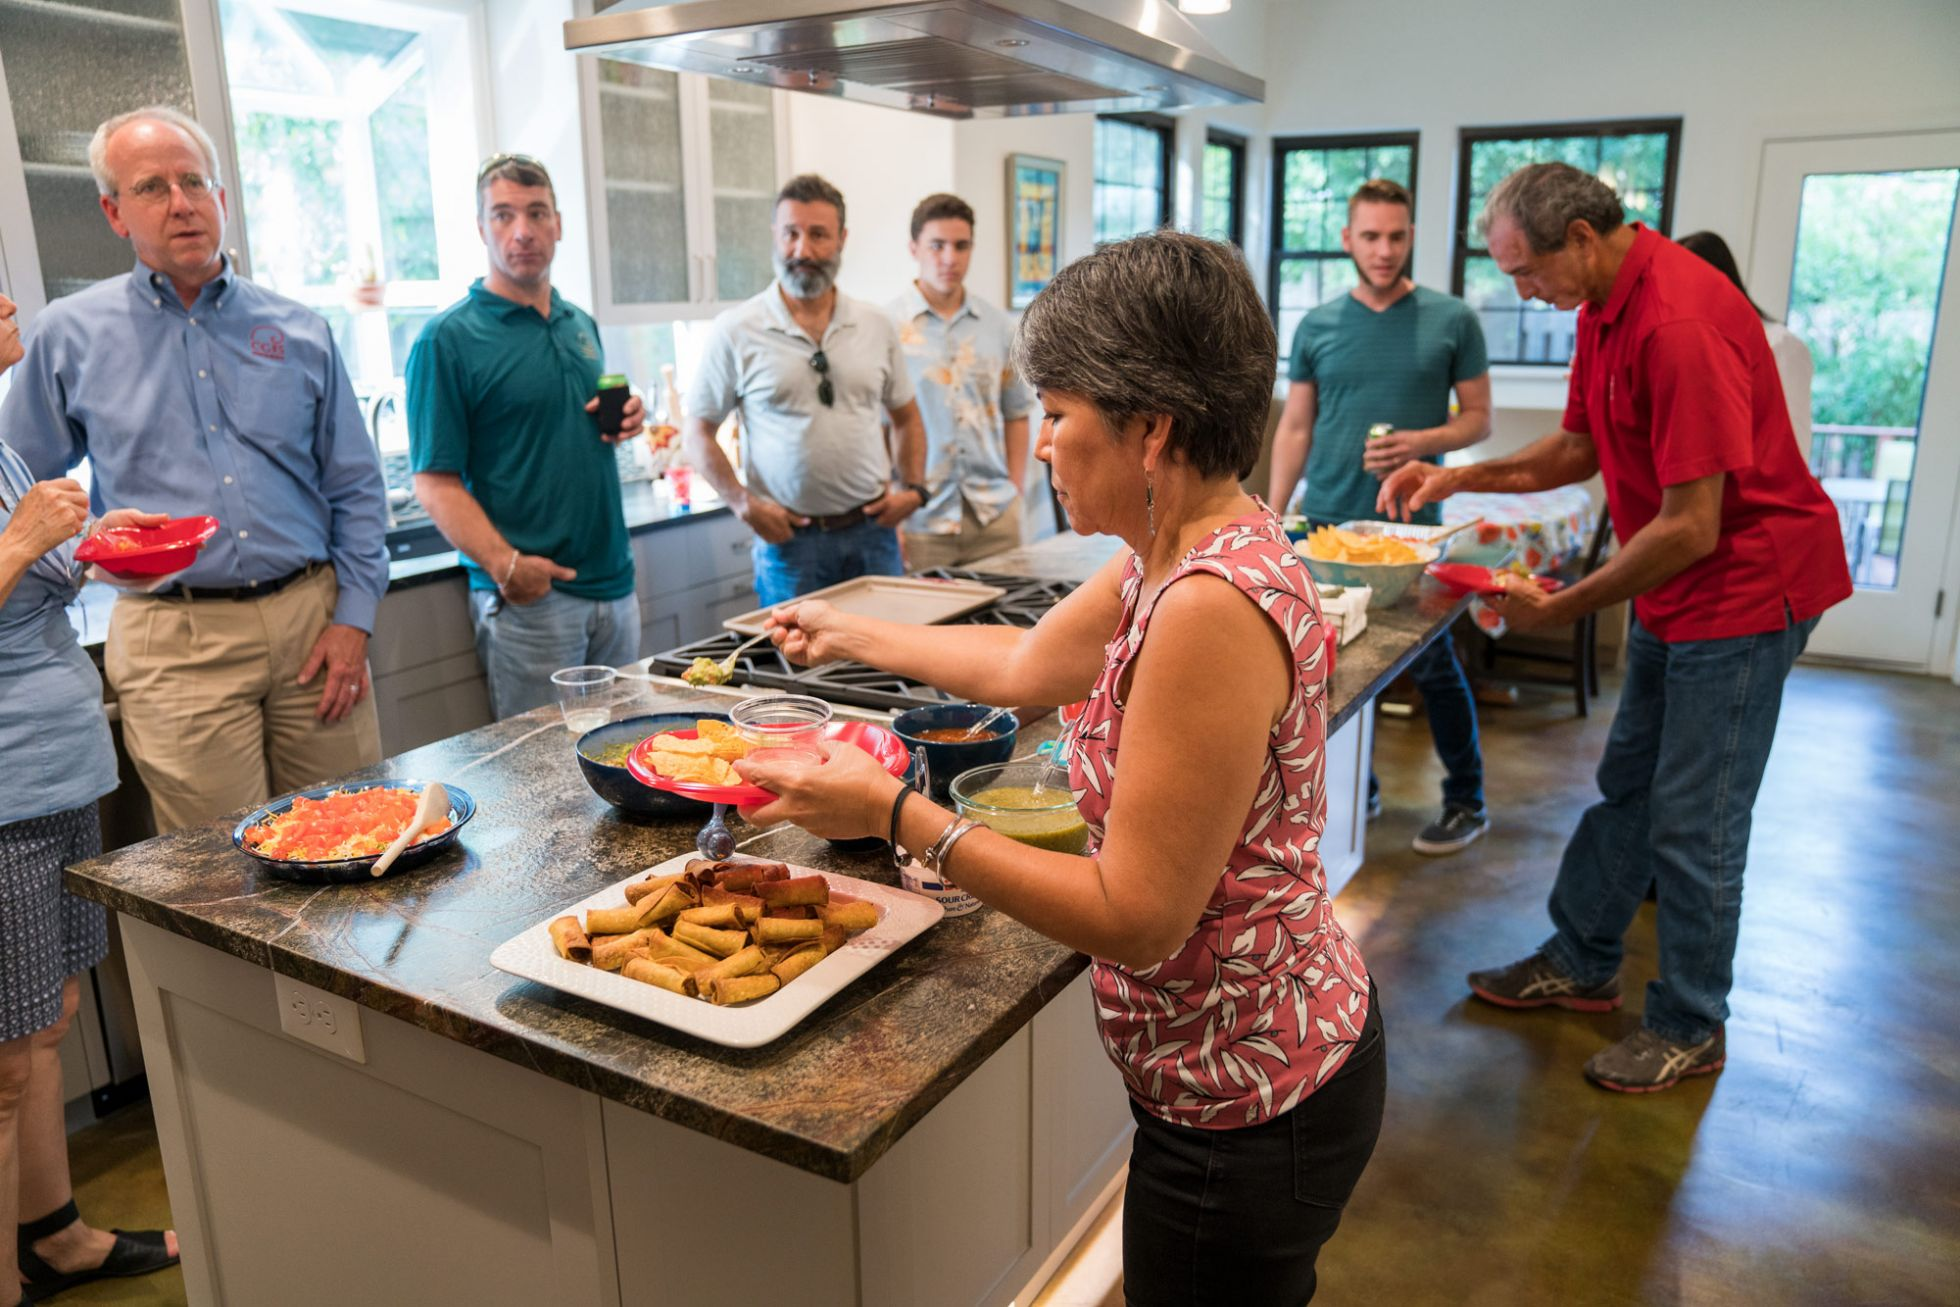 People gathered around kitchen island